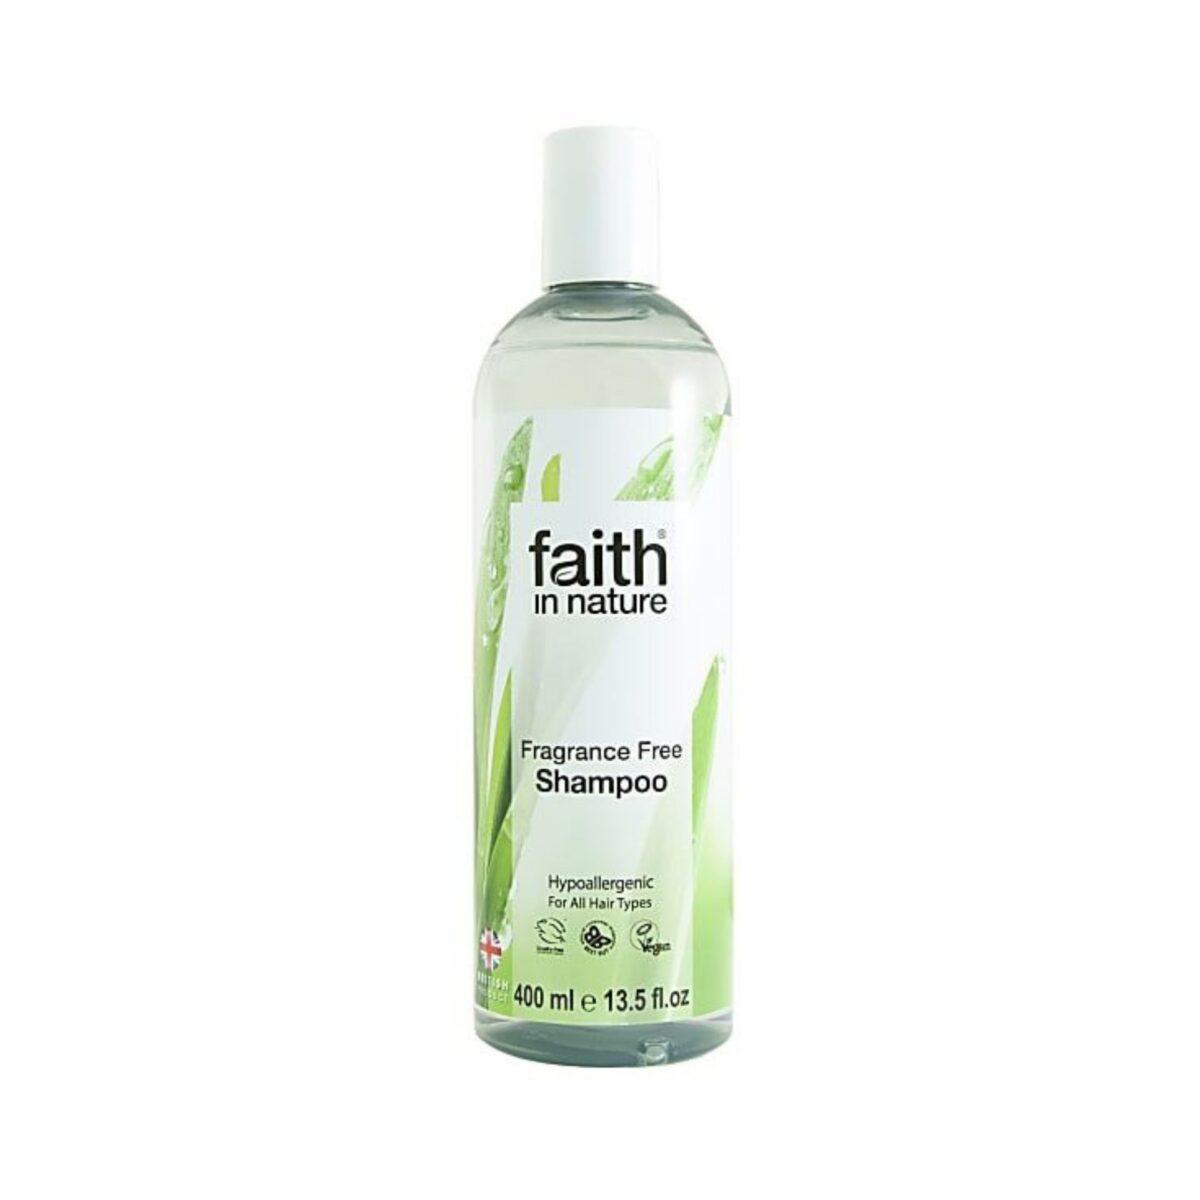 faith-in-nature-fragrance-free-shampoo-400-ml-501445